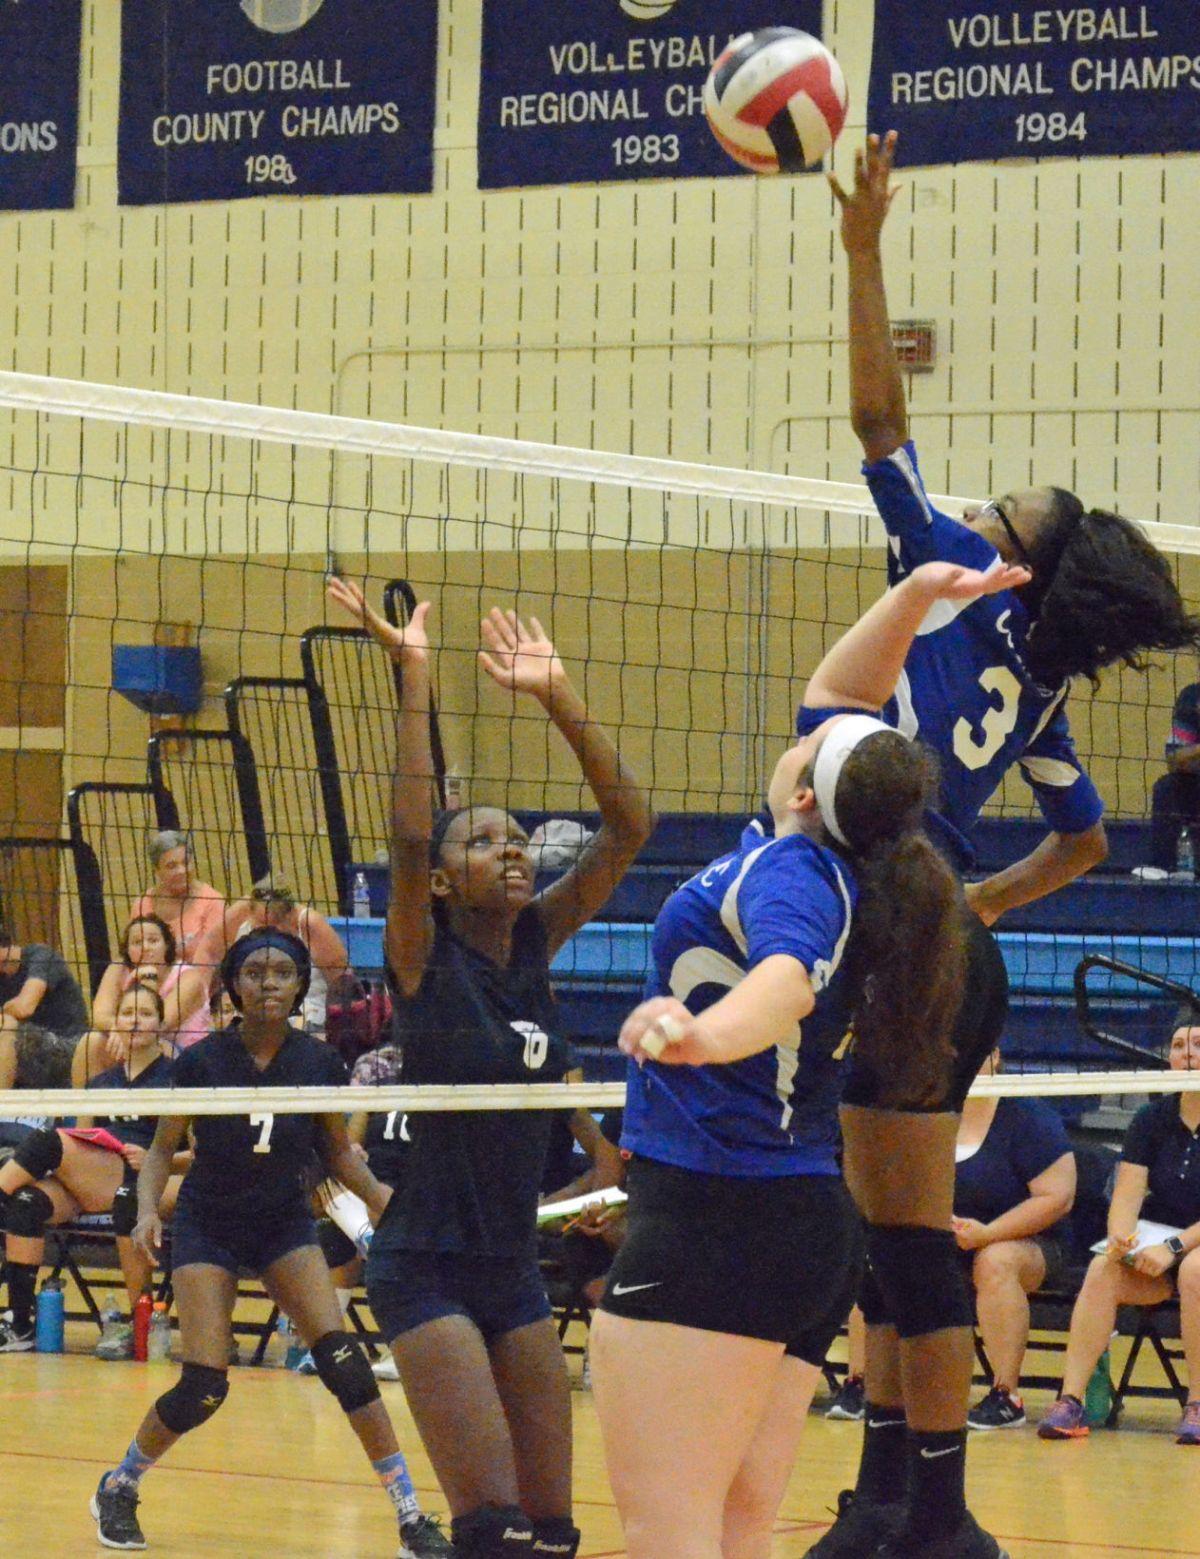 Chesapeake volleyball wins inaugural Bayhawk tournament ...